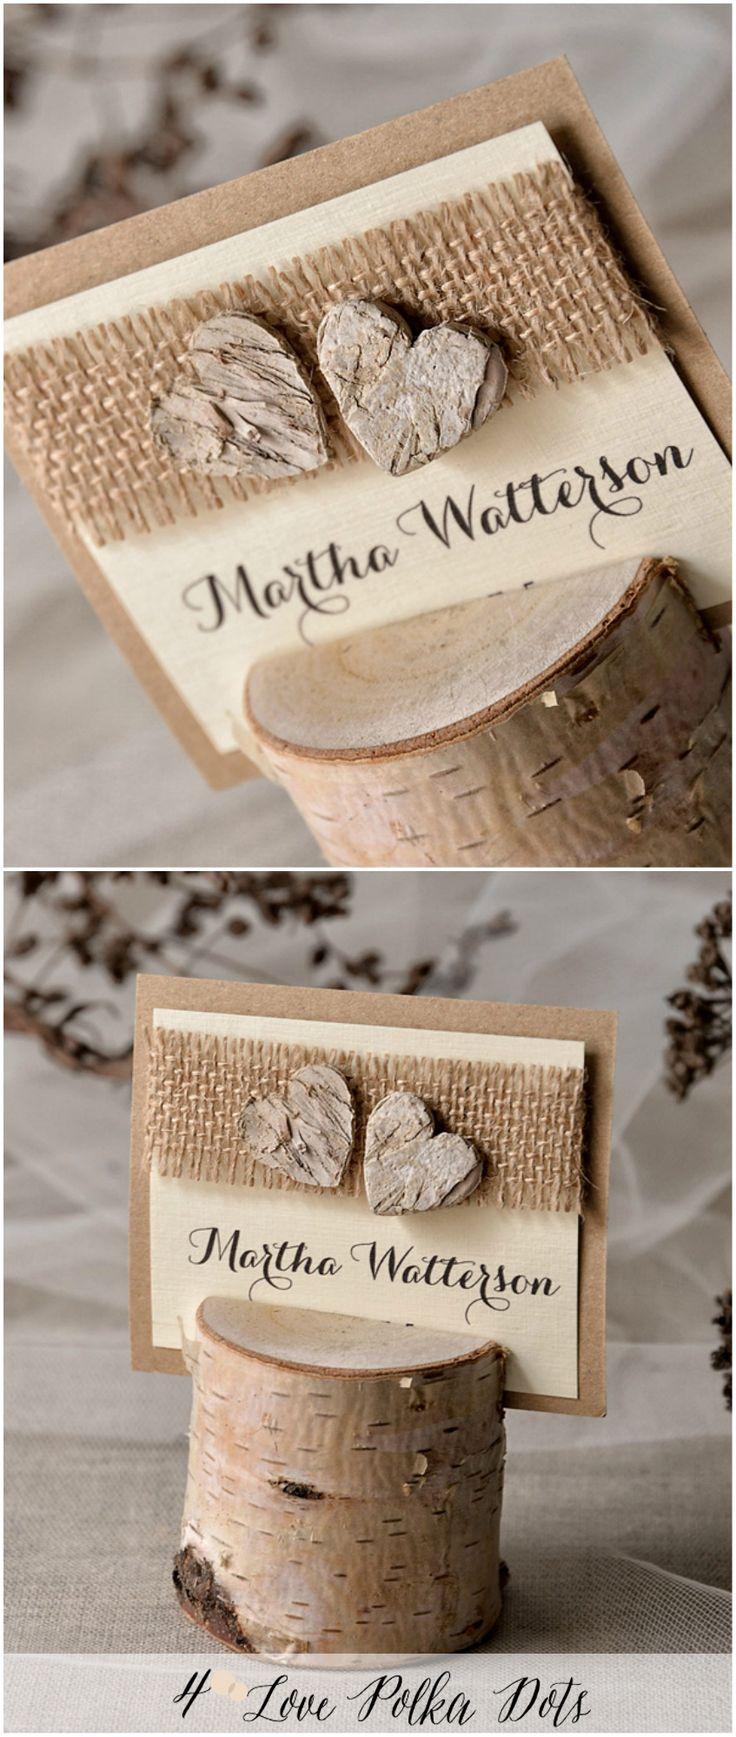 525 Best Rustic Wedding Ideas Images On Pinterest Weddingideas